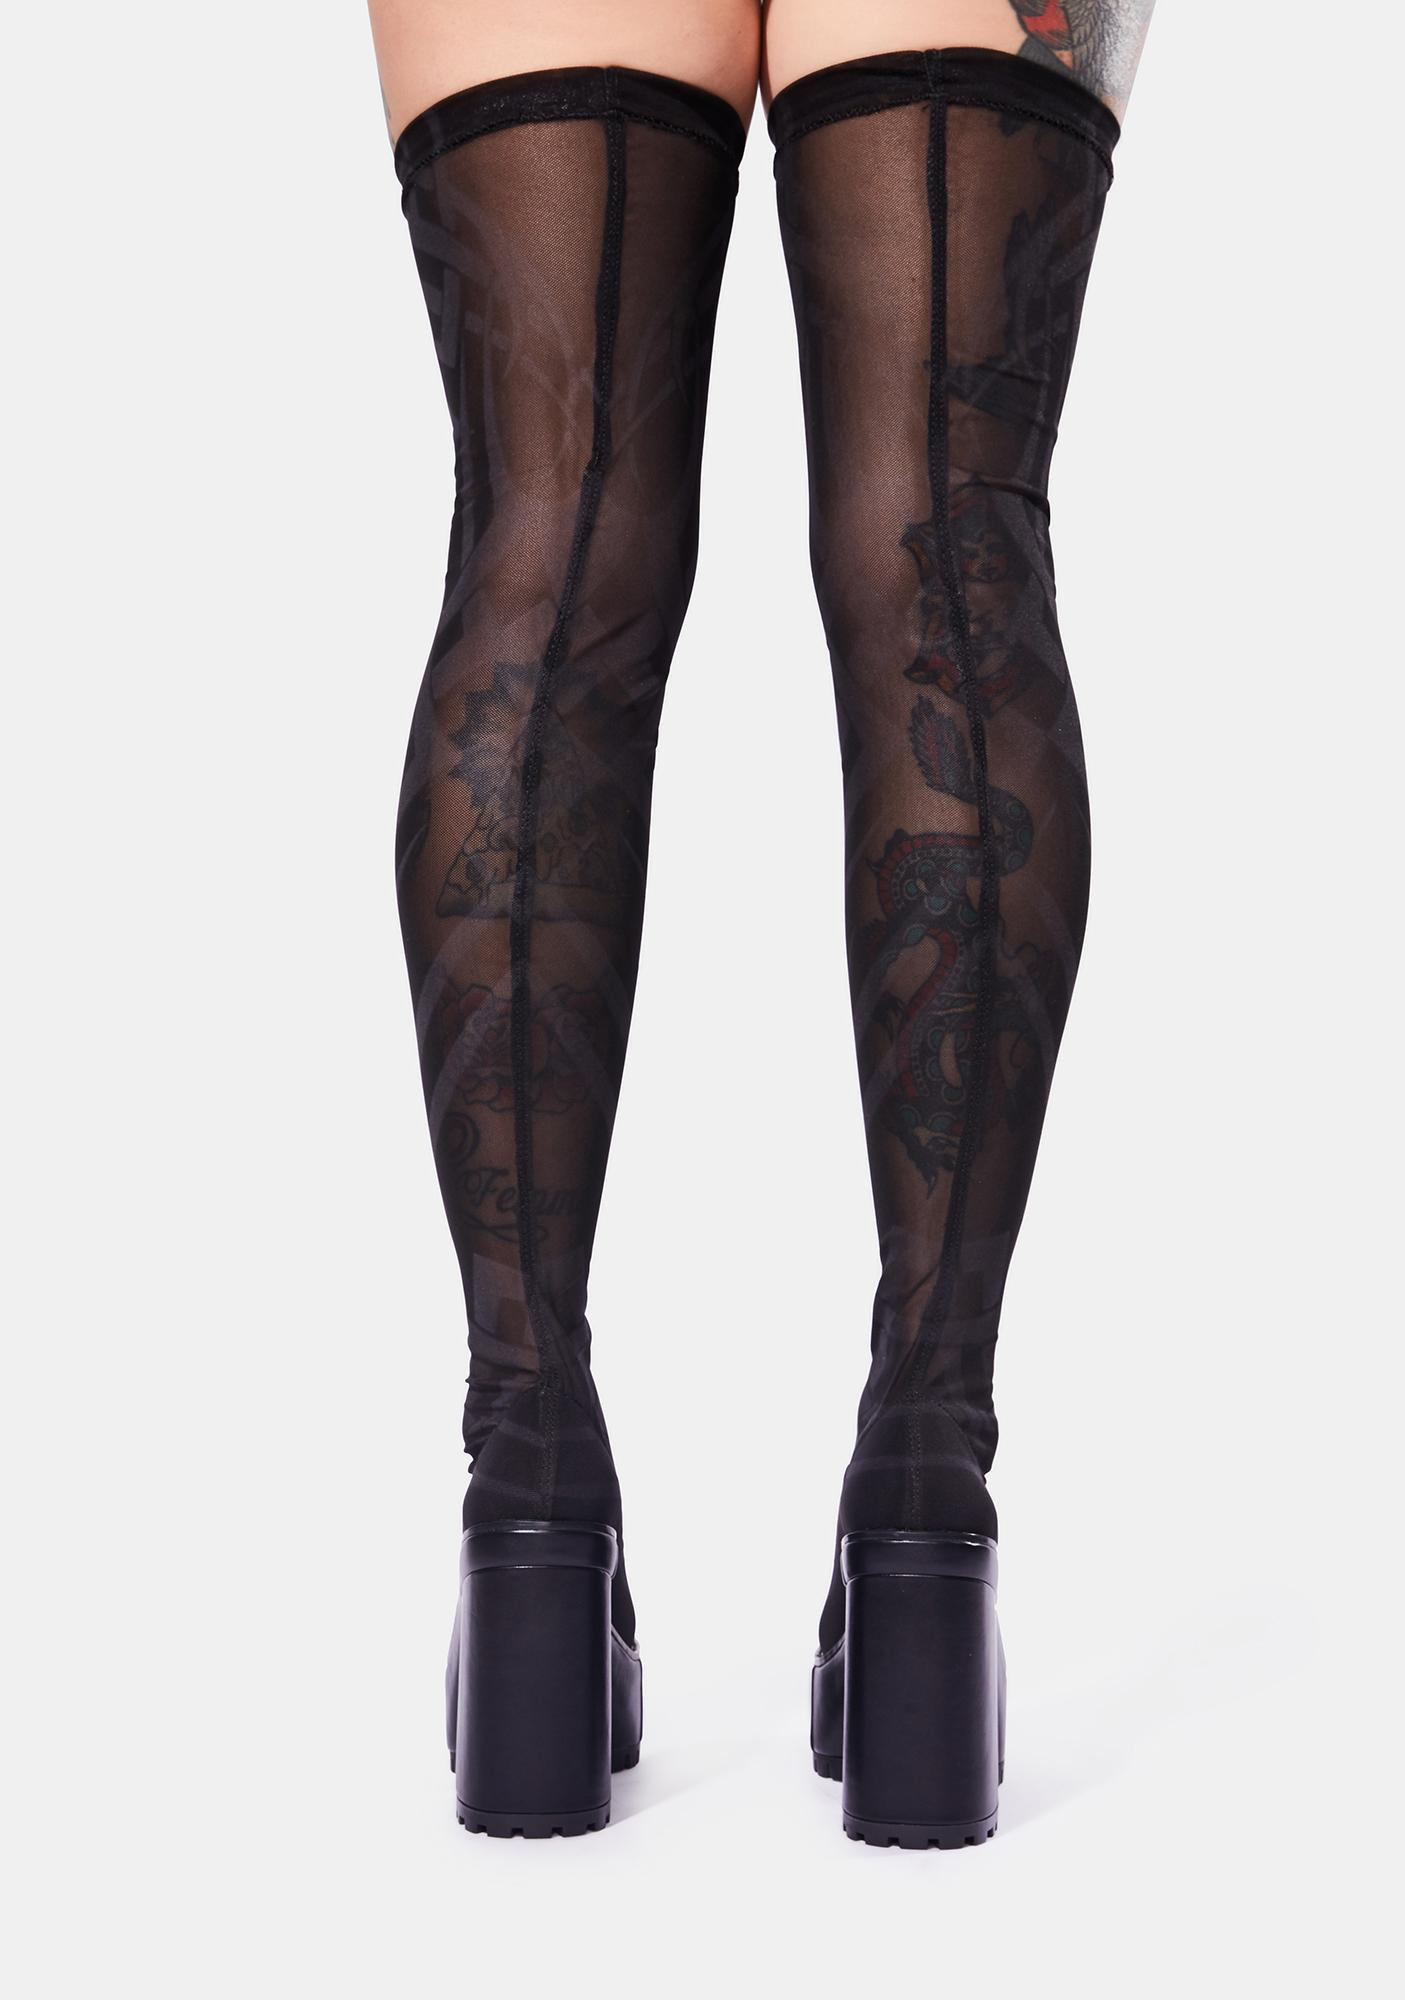 DARKER WAVS Snare Tattoo Print Mesh Thigh High Boots